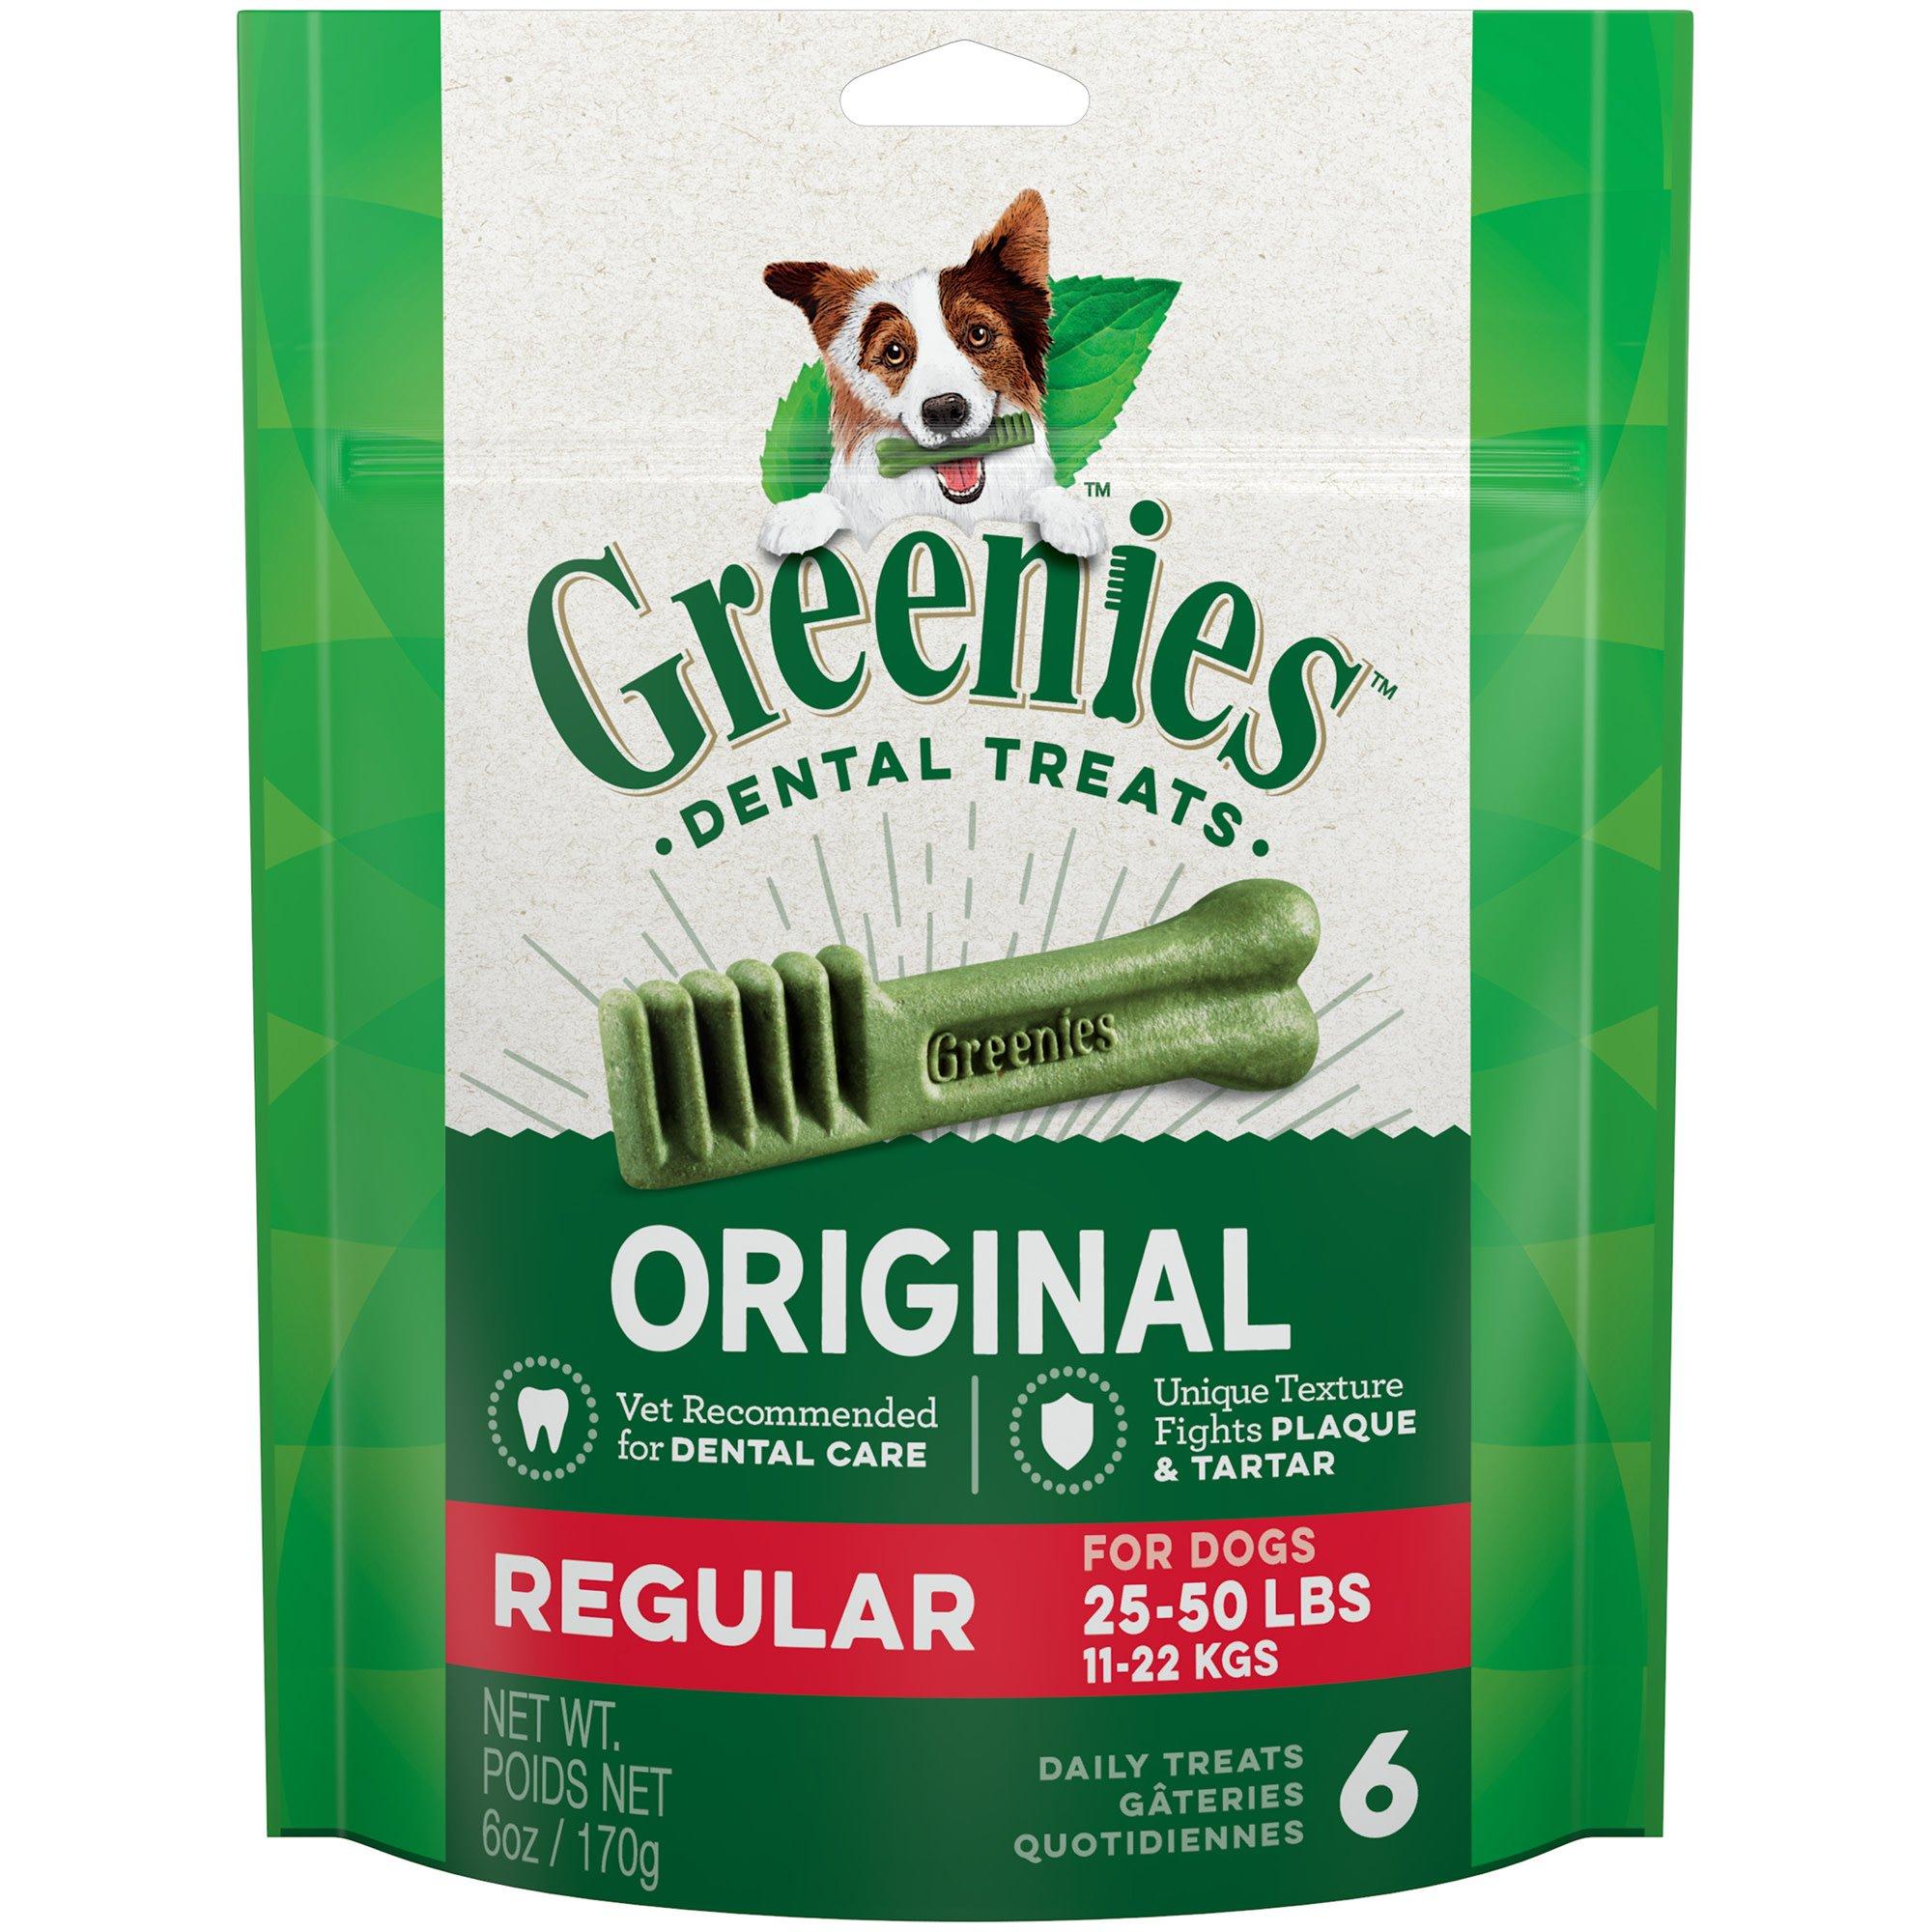 Greenies Original Regular Dental Dog Treats, 6-count